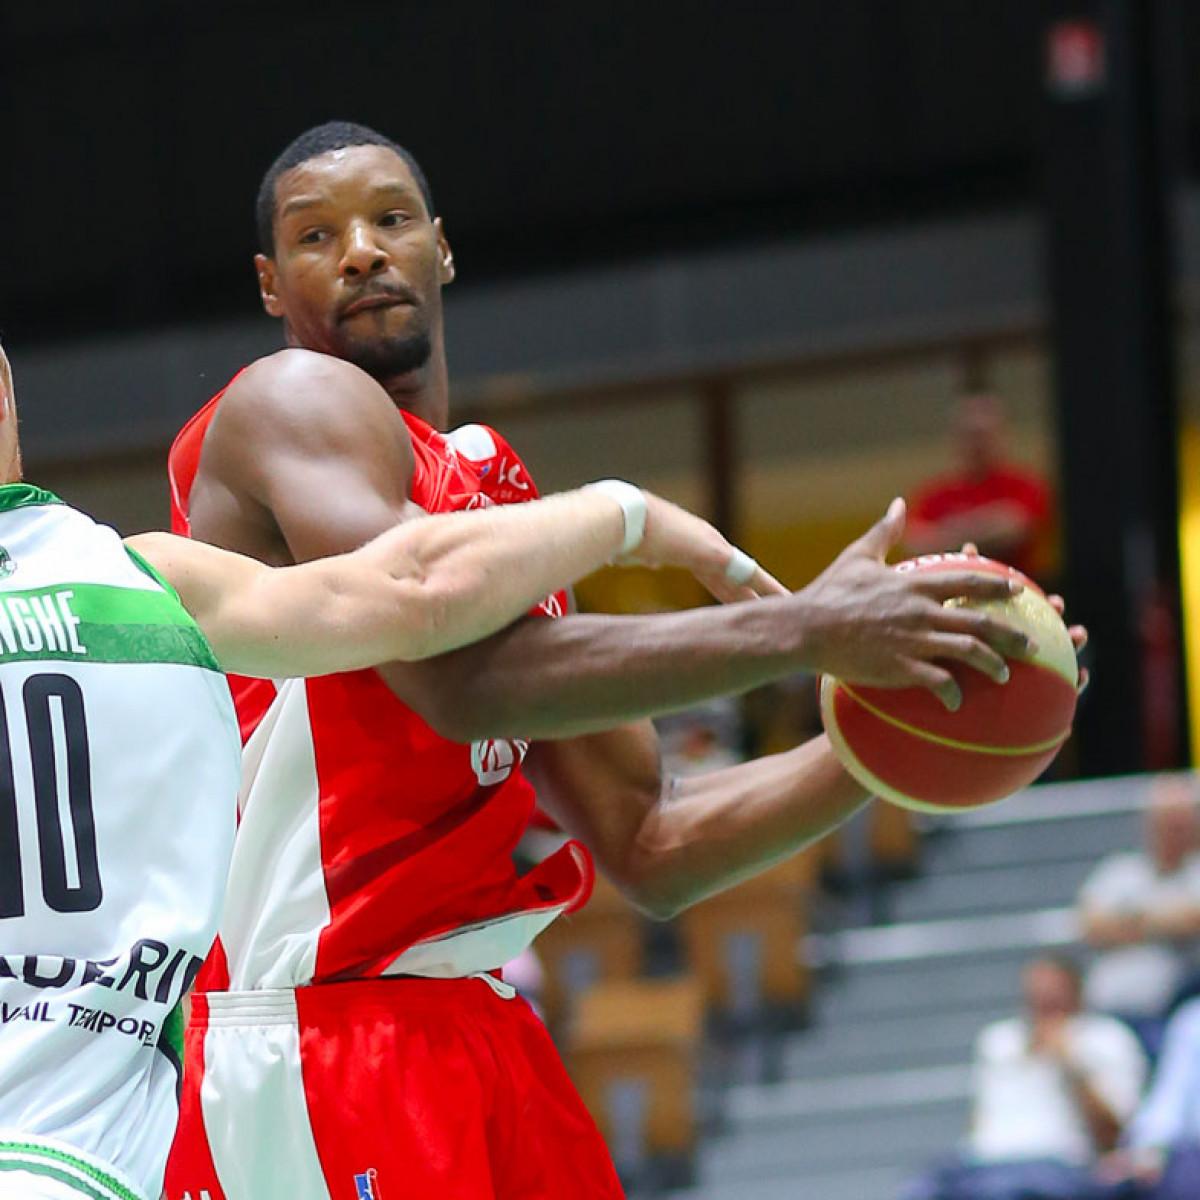 Photo of Grismay Paumier, 2019-2020 season